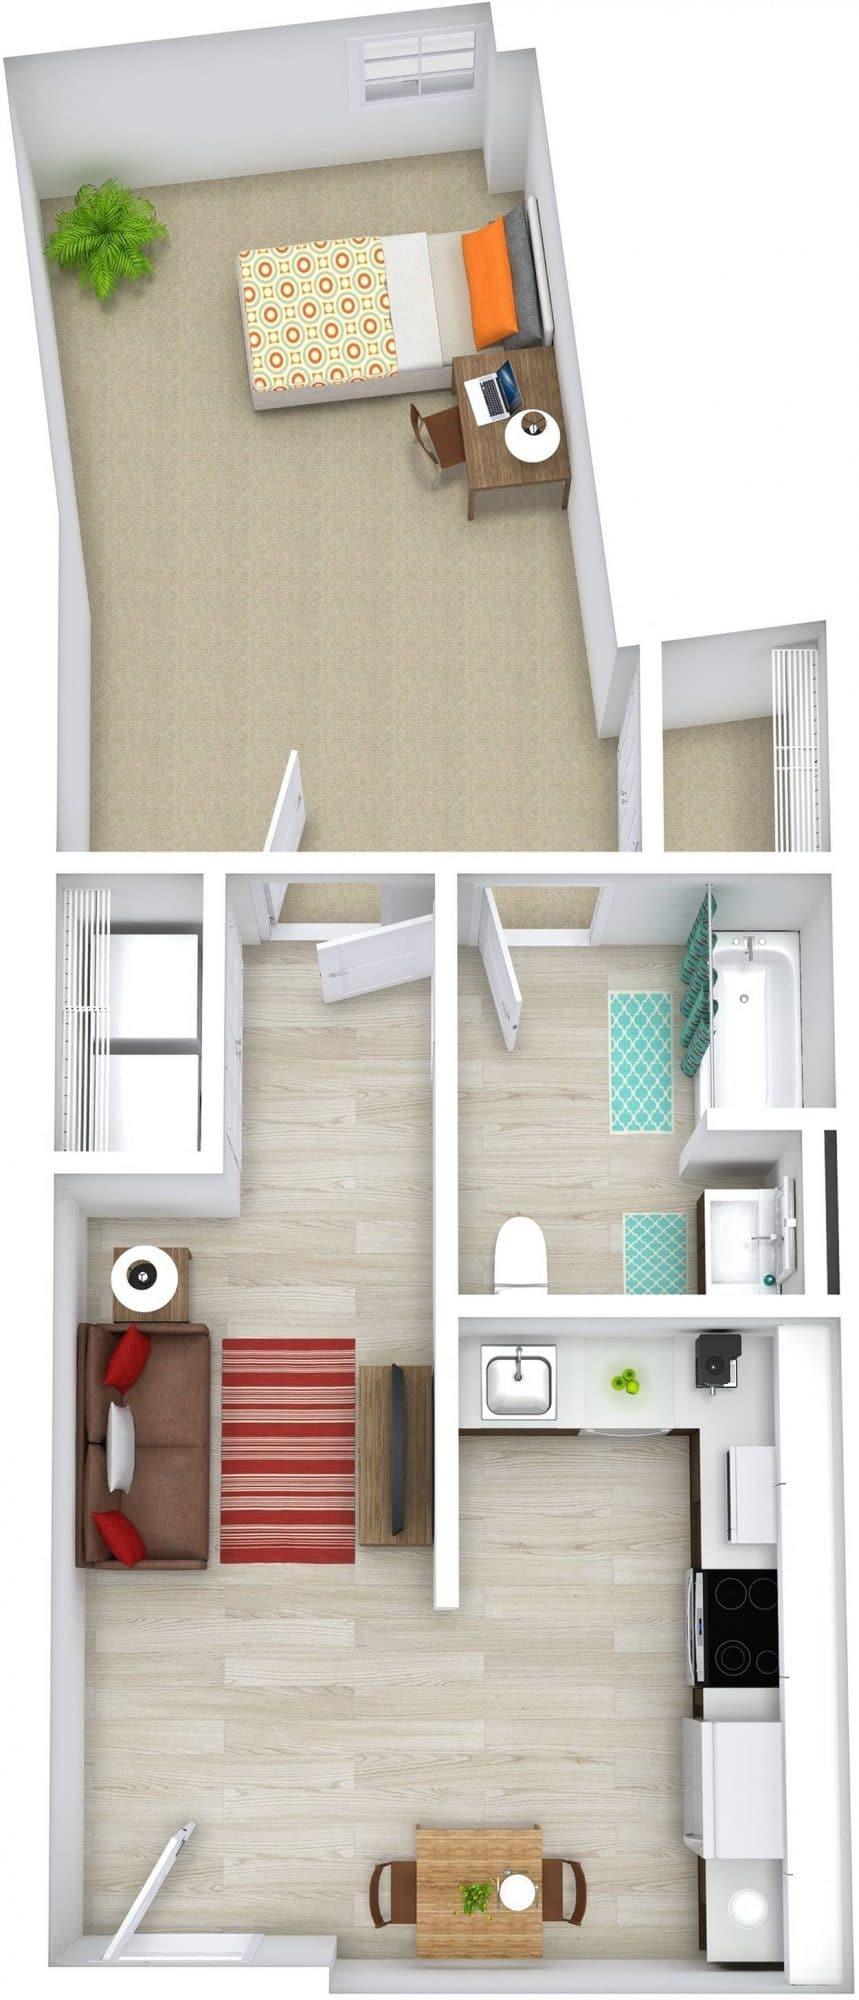 12 North Floor Plan 2